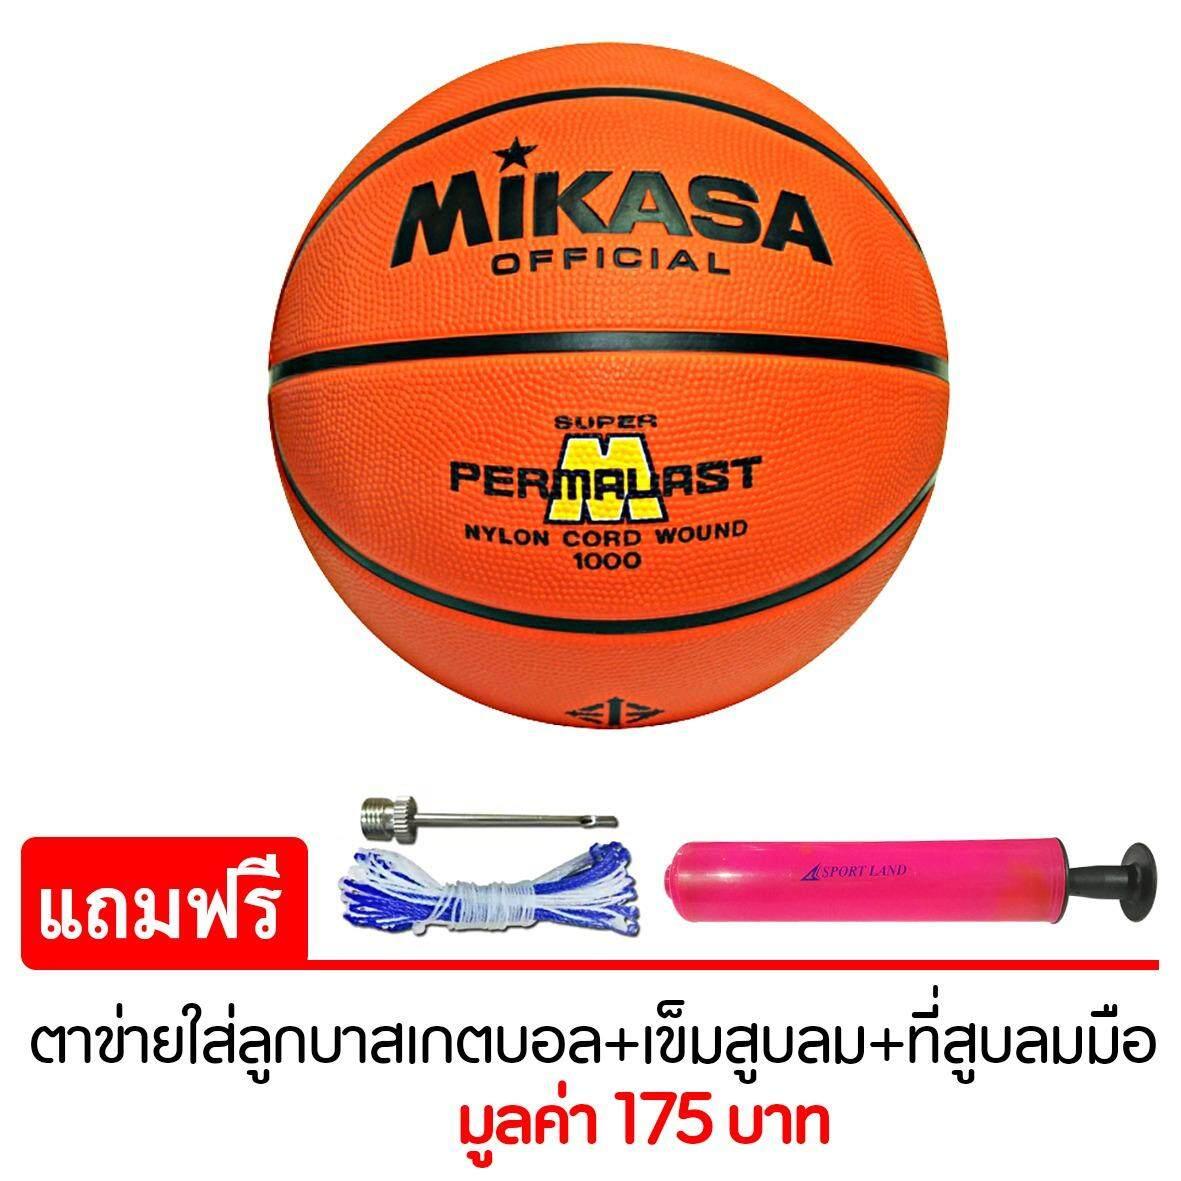 MIKASA บาสเก็ตบอลBasketball MKS RB 1000 แถมฟรี ตาข่ายใส่ลูกบาสเกตบอล + เข็มสูบสูบลม + สูบมือ SPL รุ่น SL6 สีชมพู